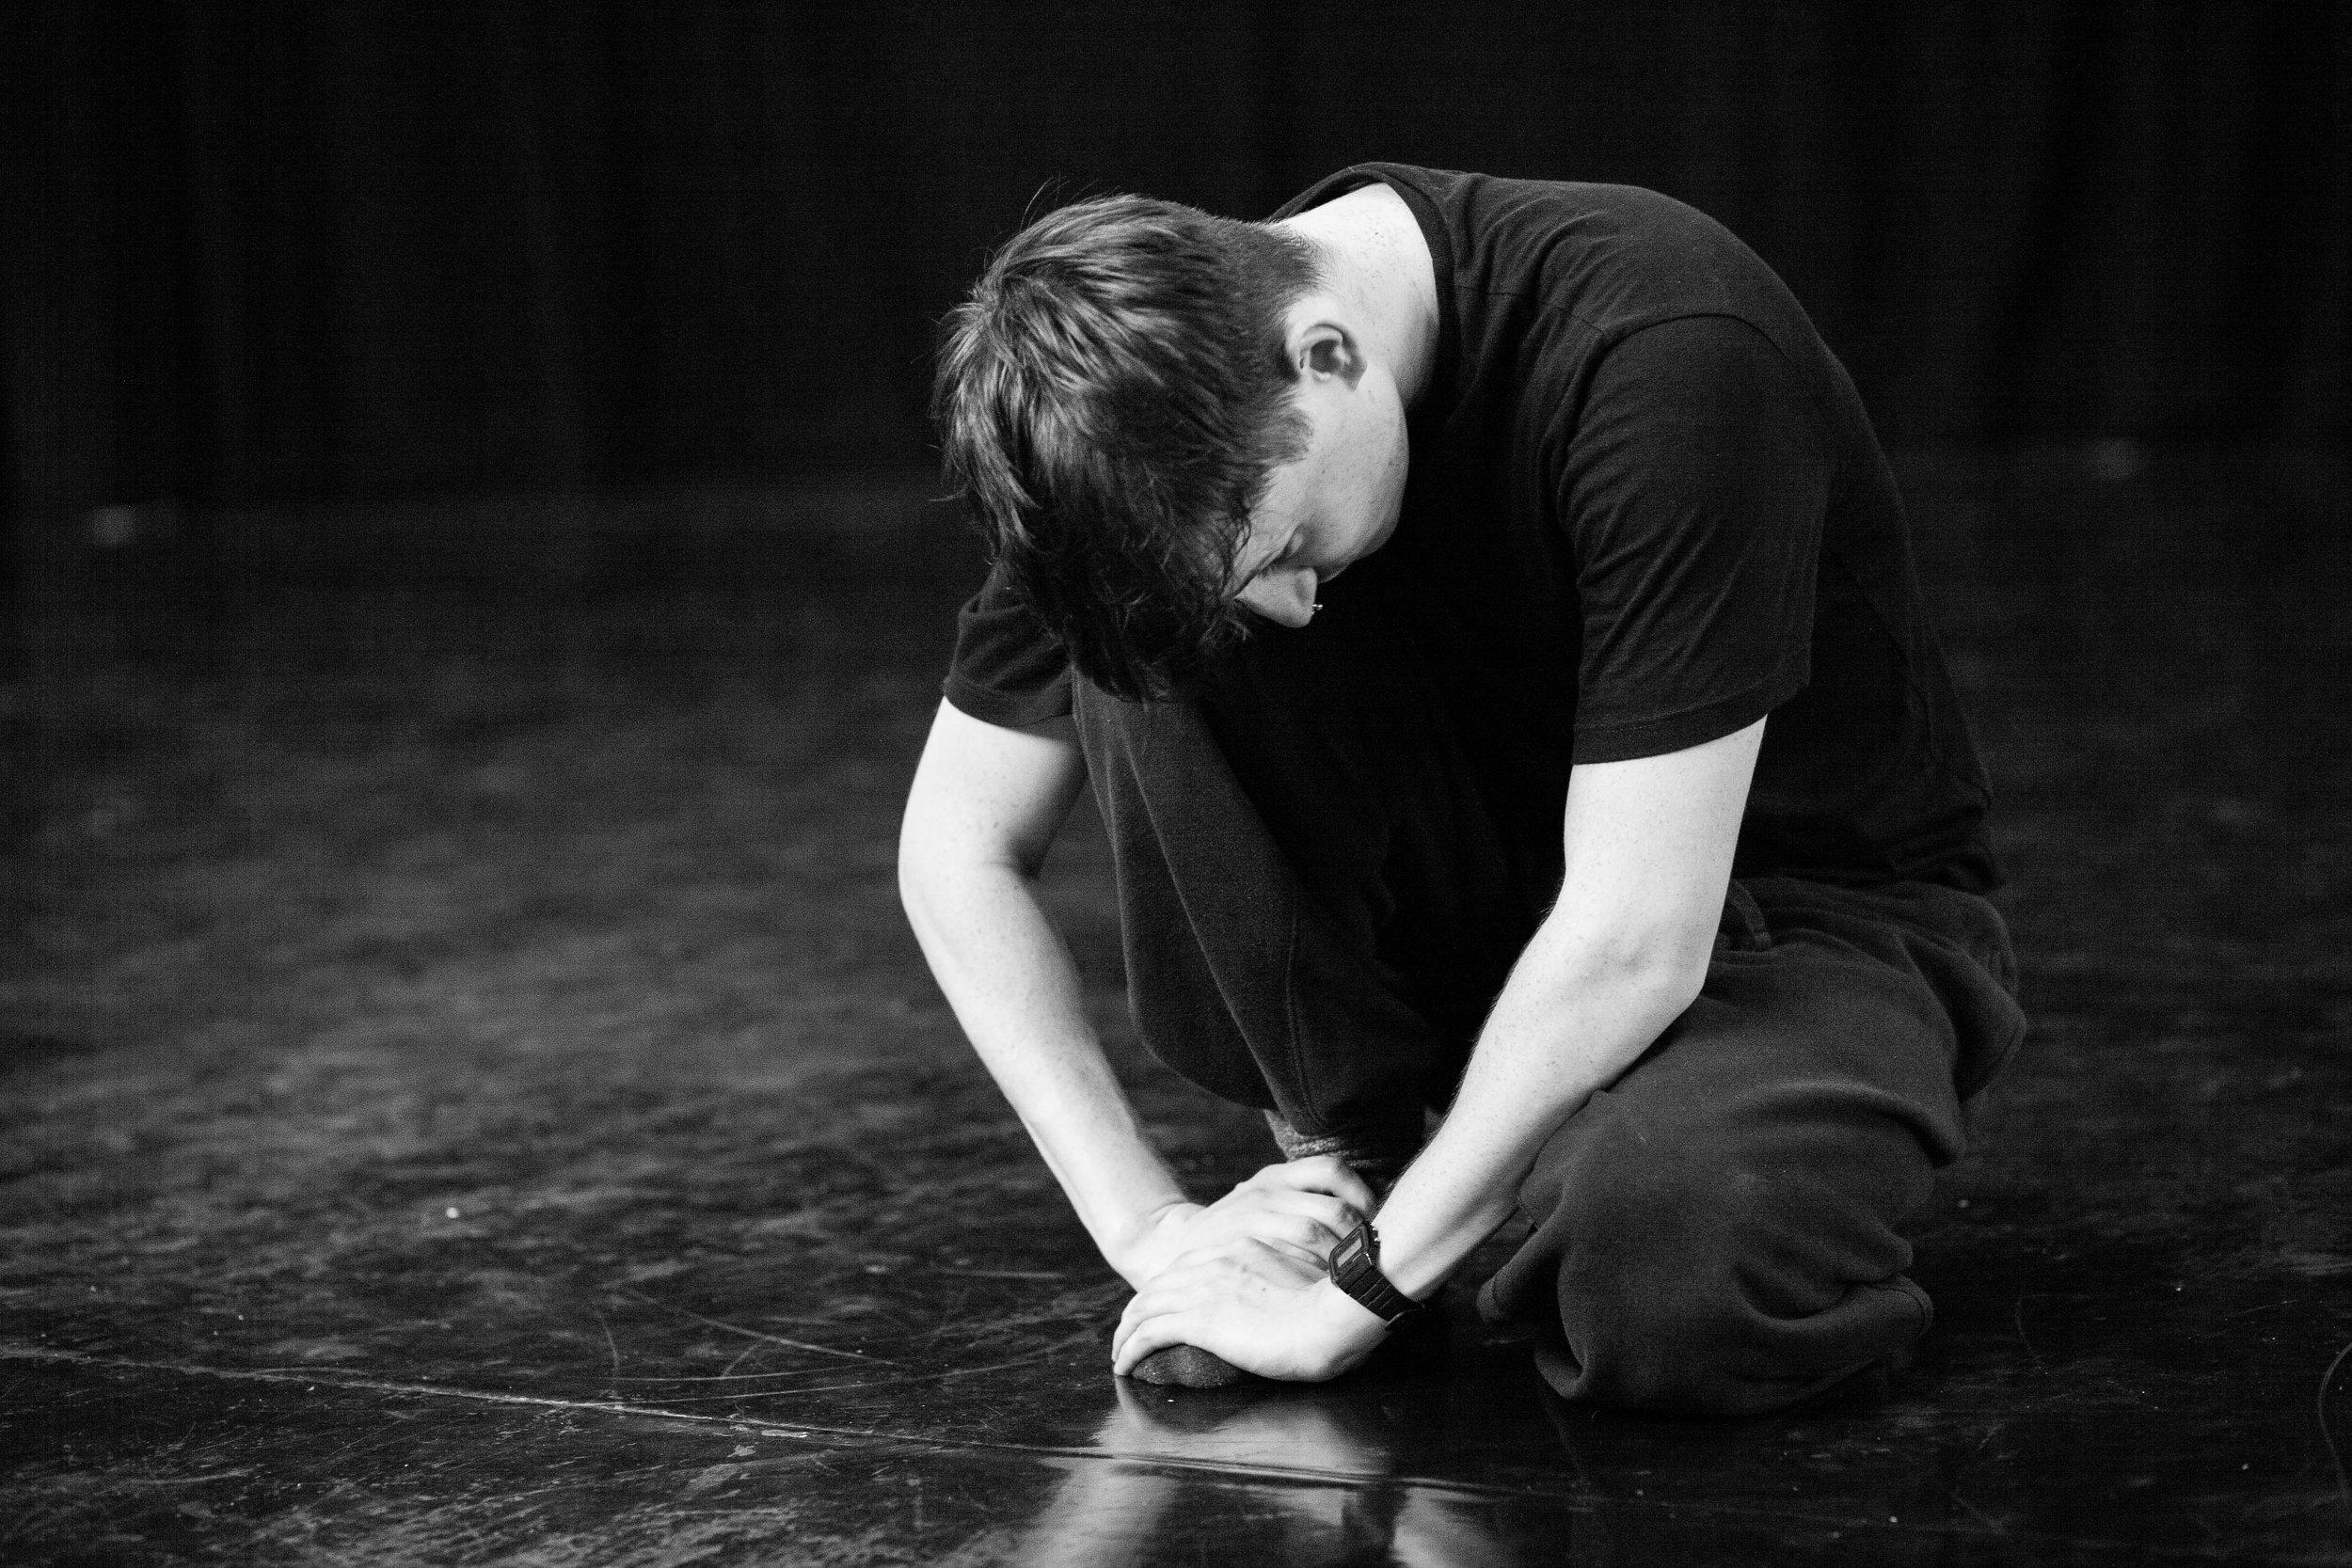 Joseph Beay-Reid, professional dancer and choreographer